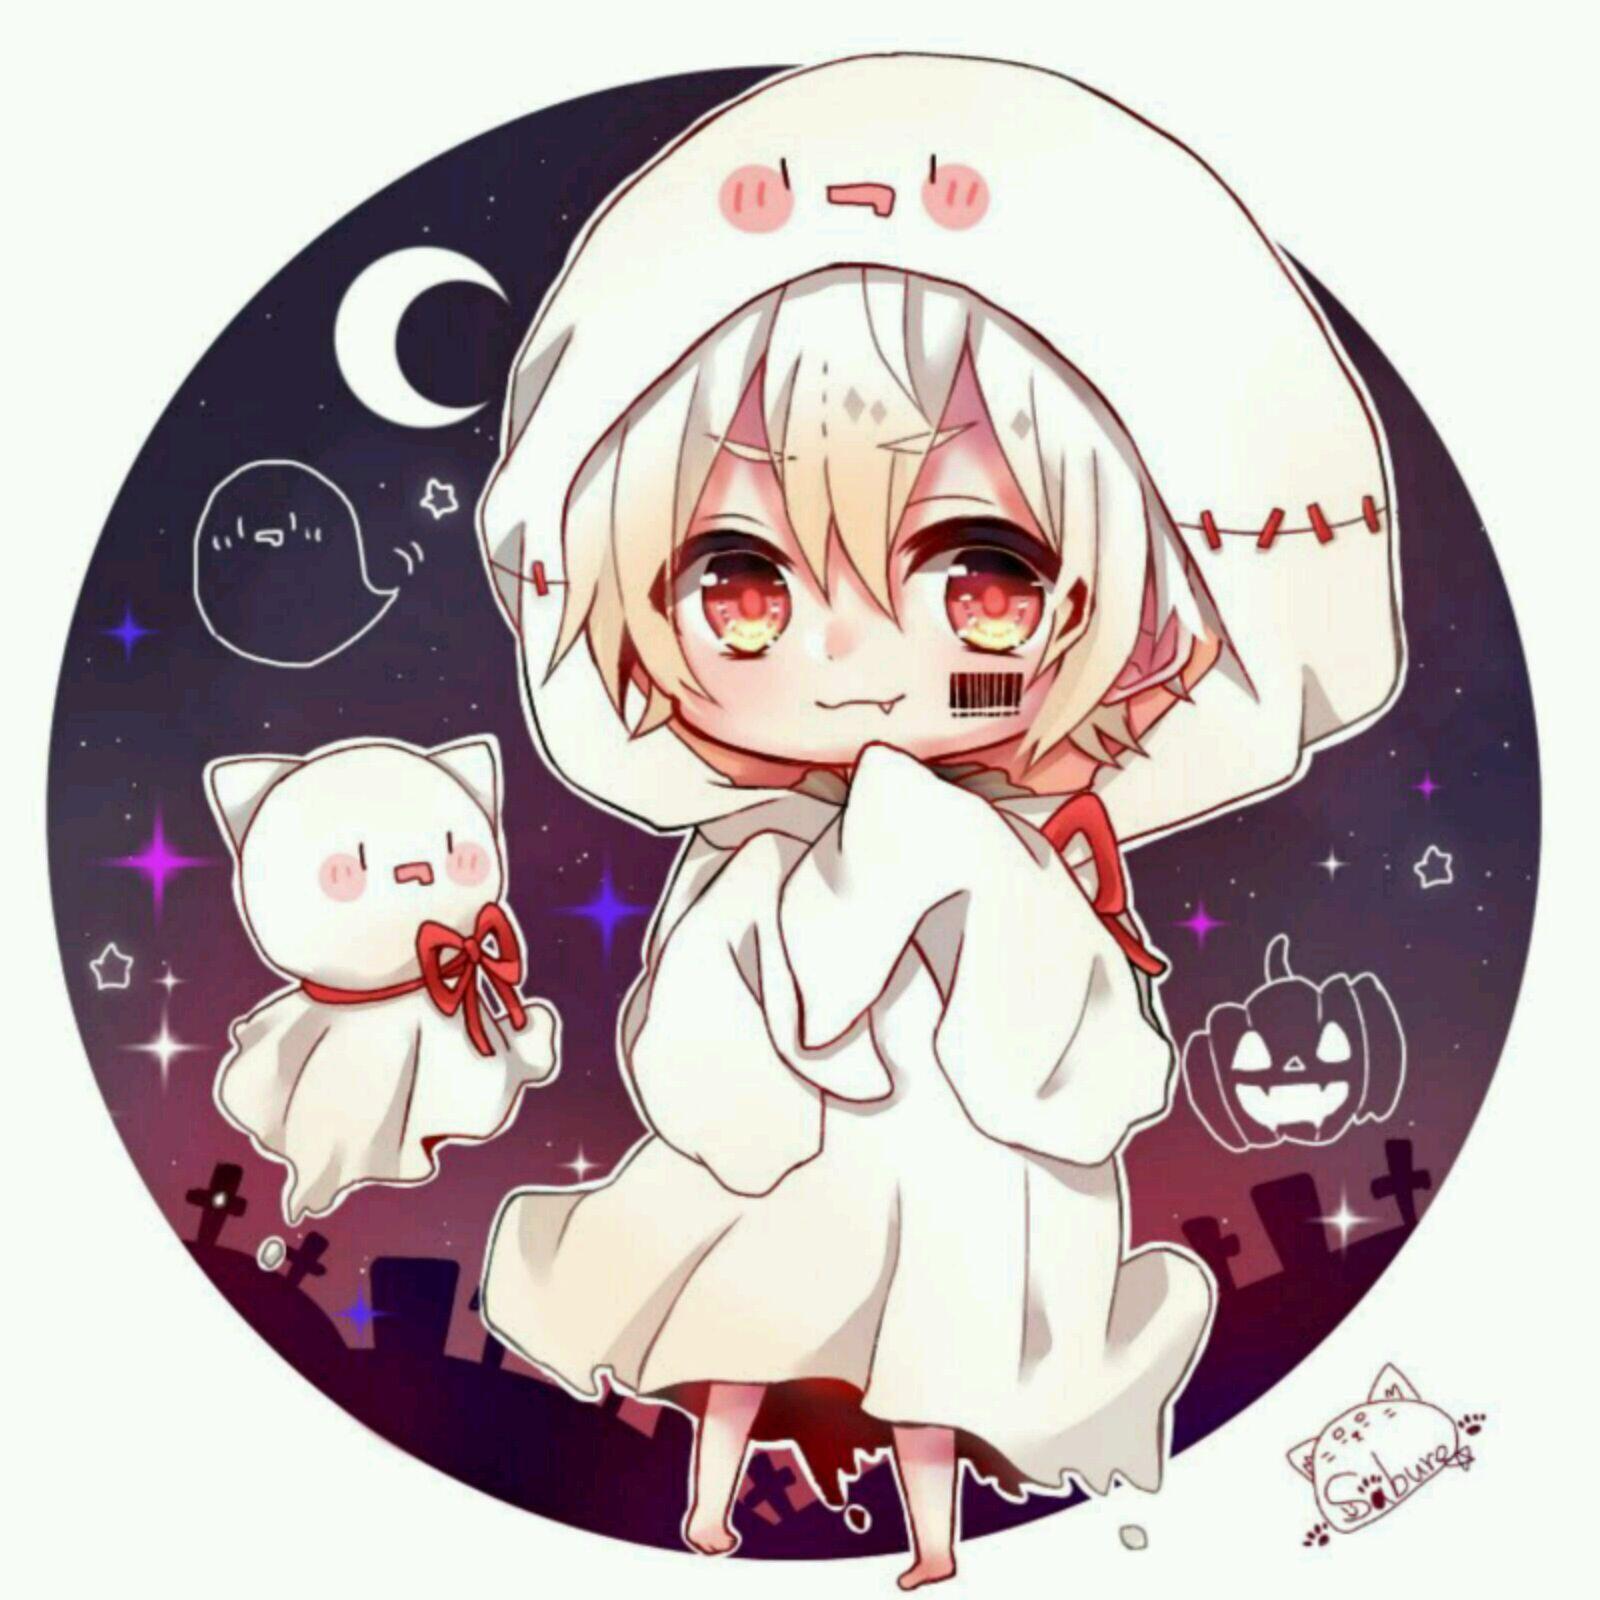 Halloween ghost ハロウィン イラスト 男の子, 天月 イラスト, アニメチビ